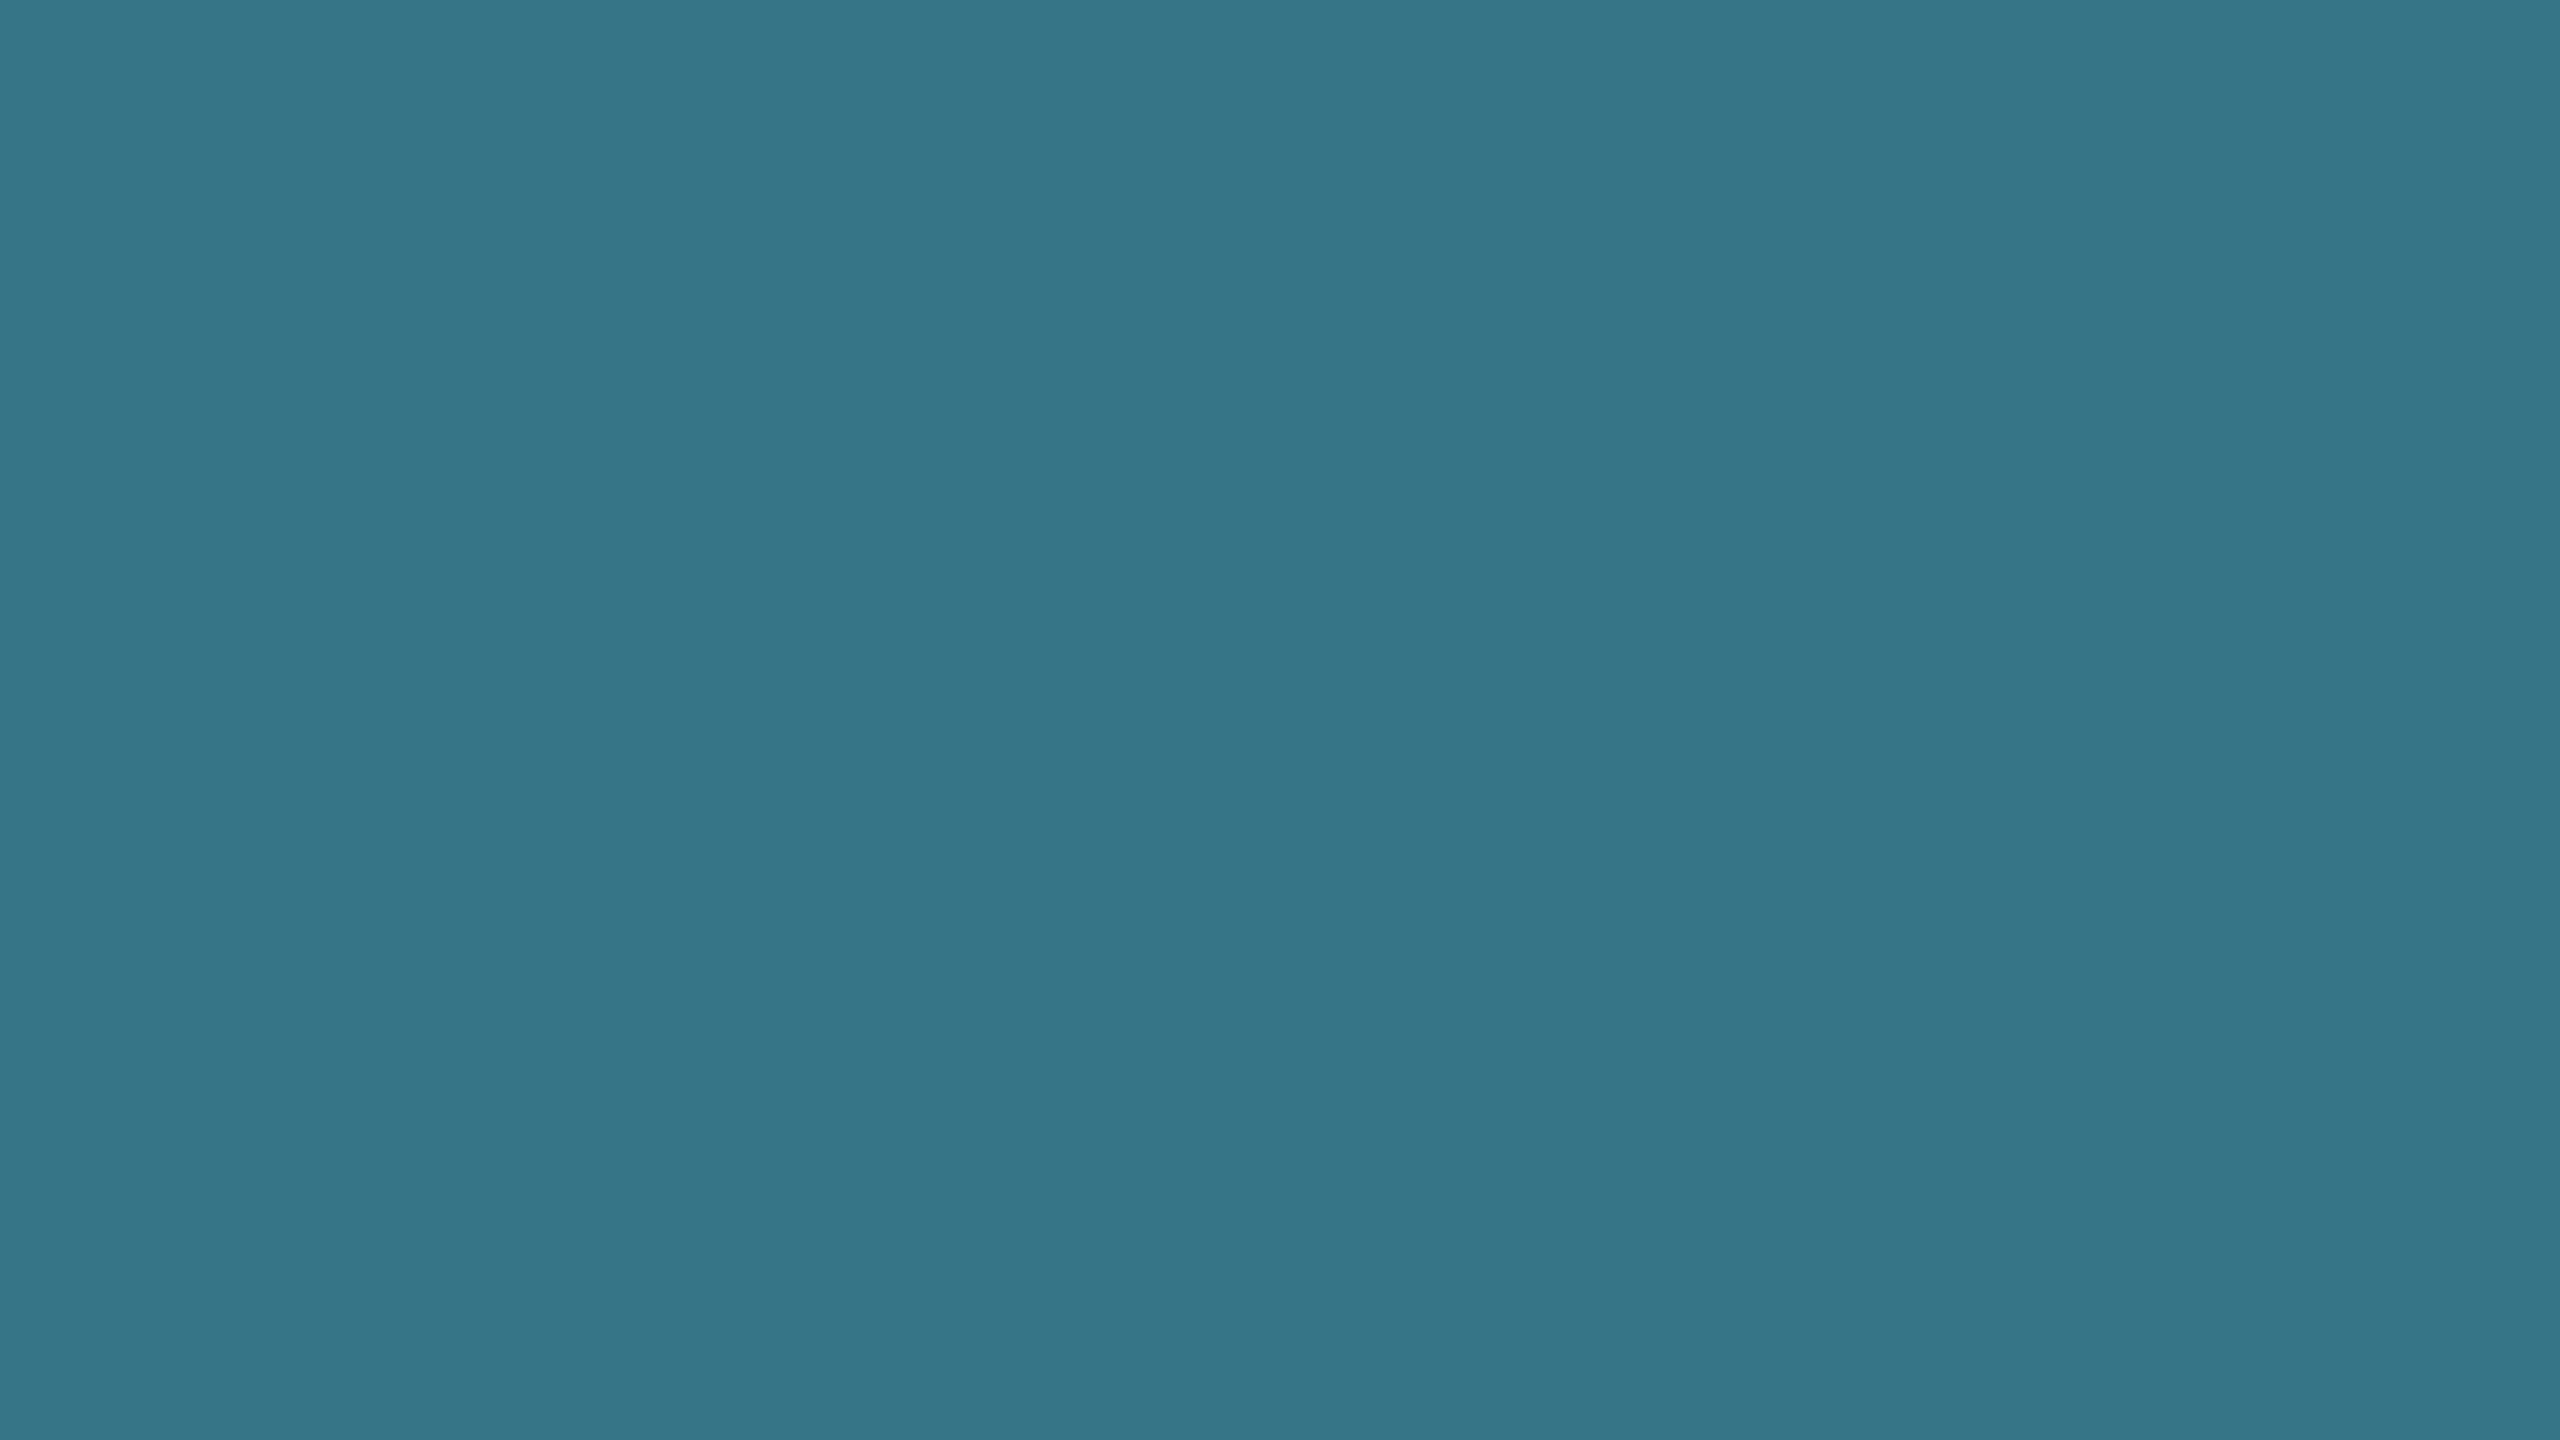 Solid Teal Blue Wallpaper 47198